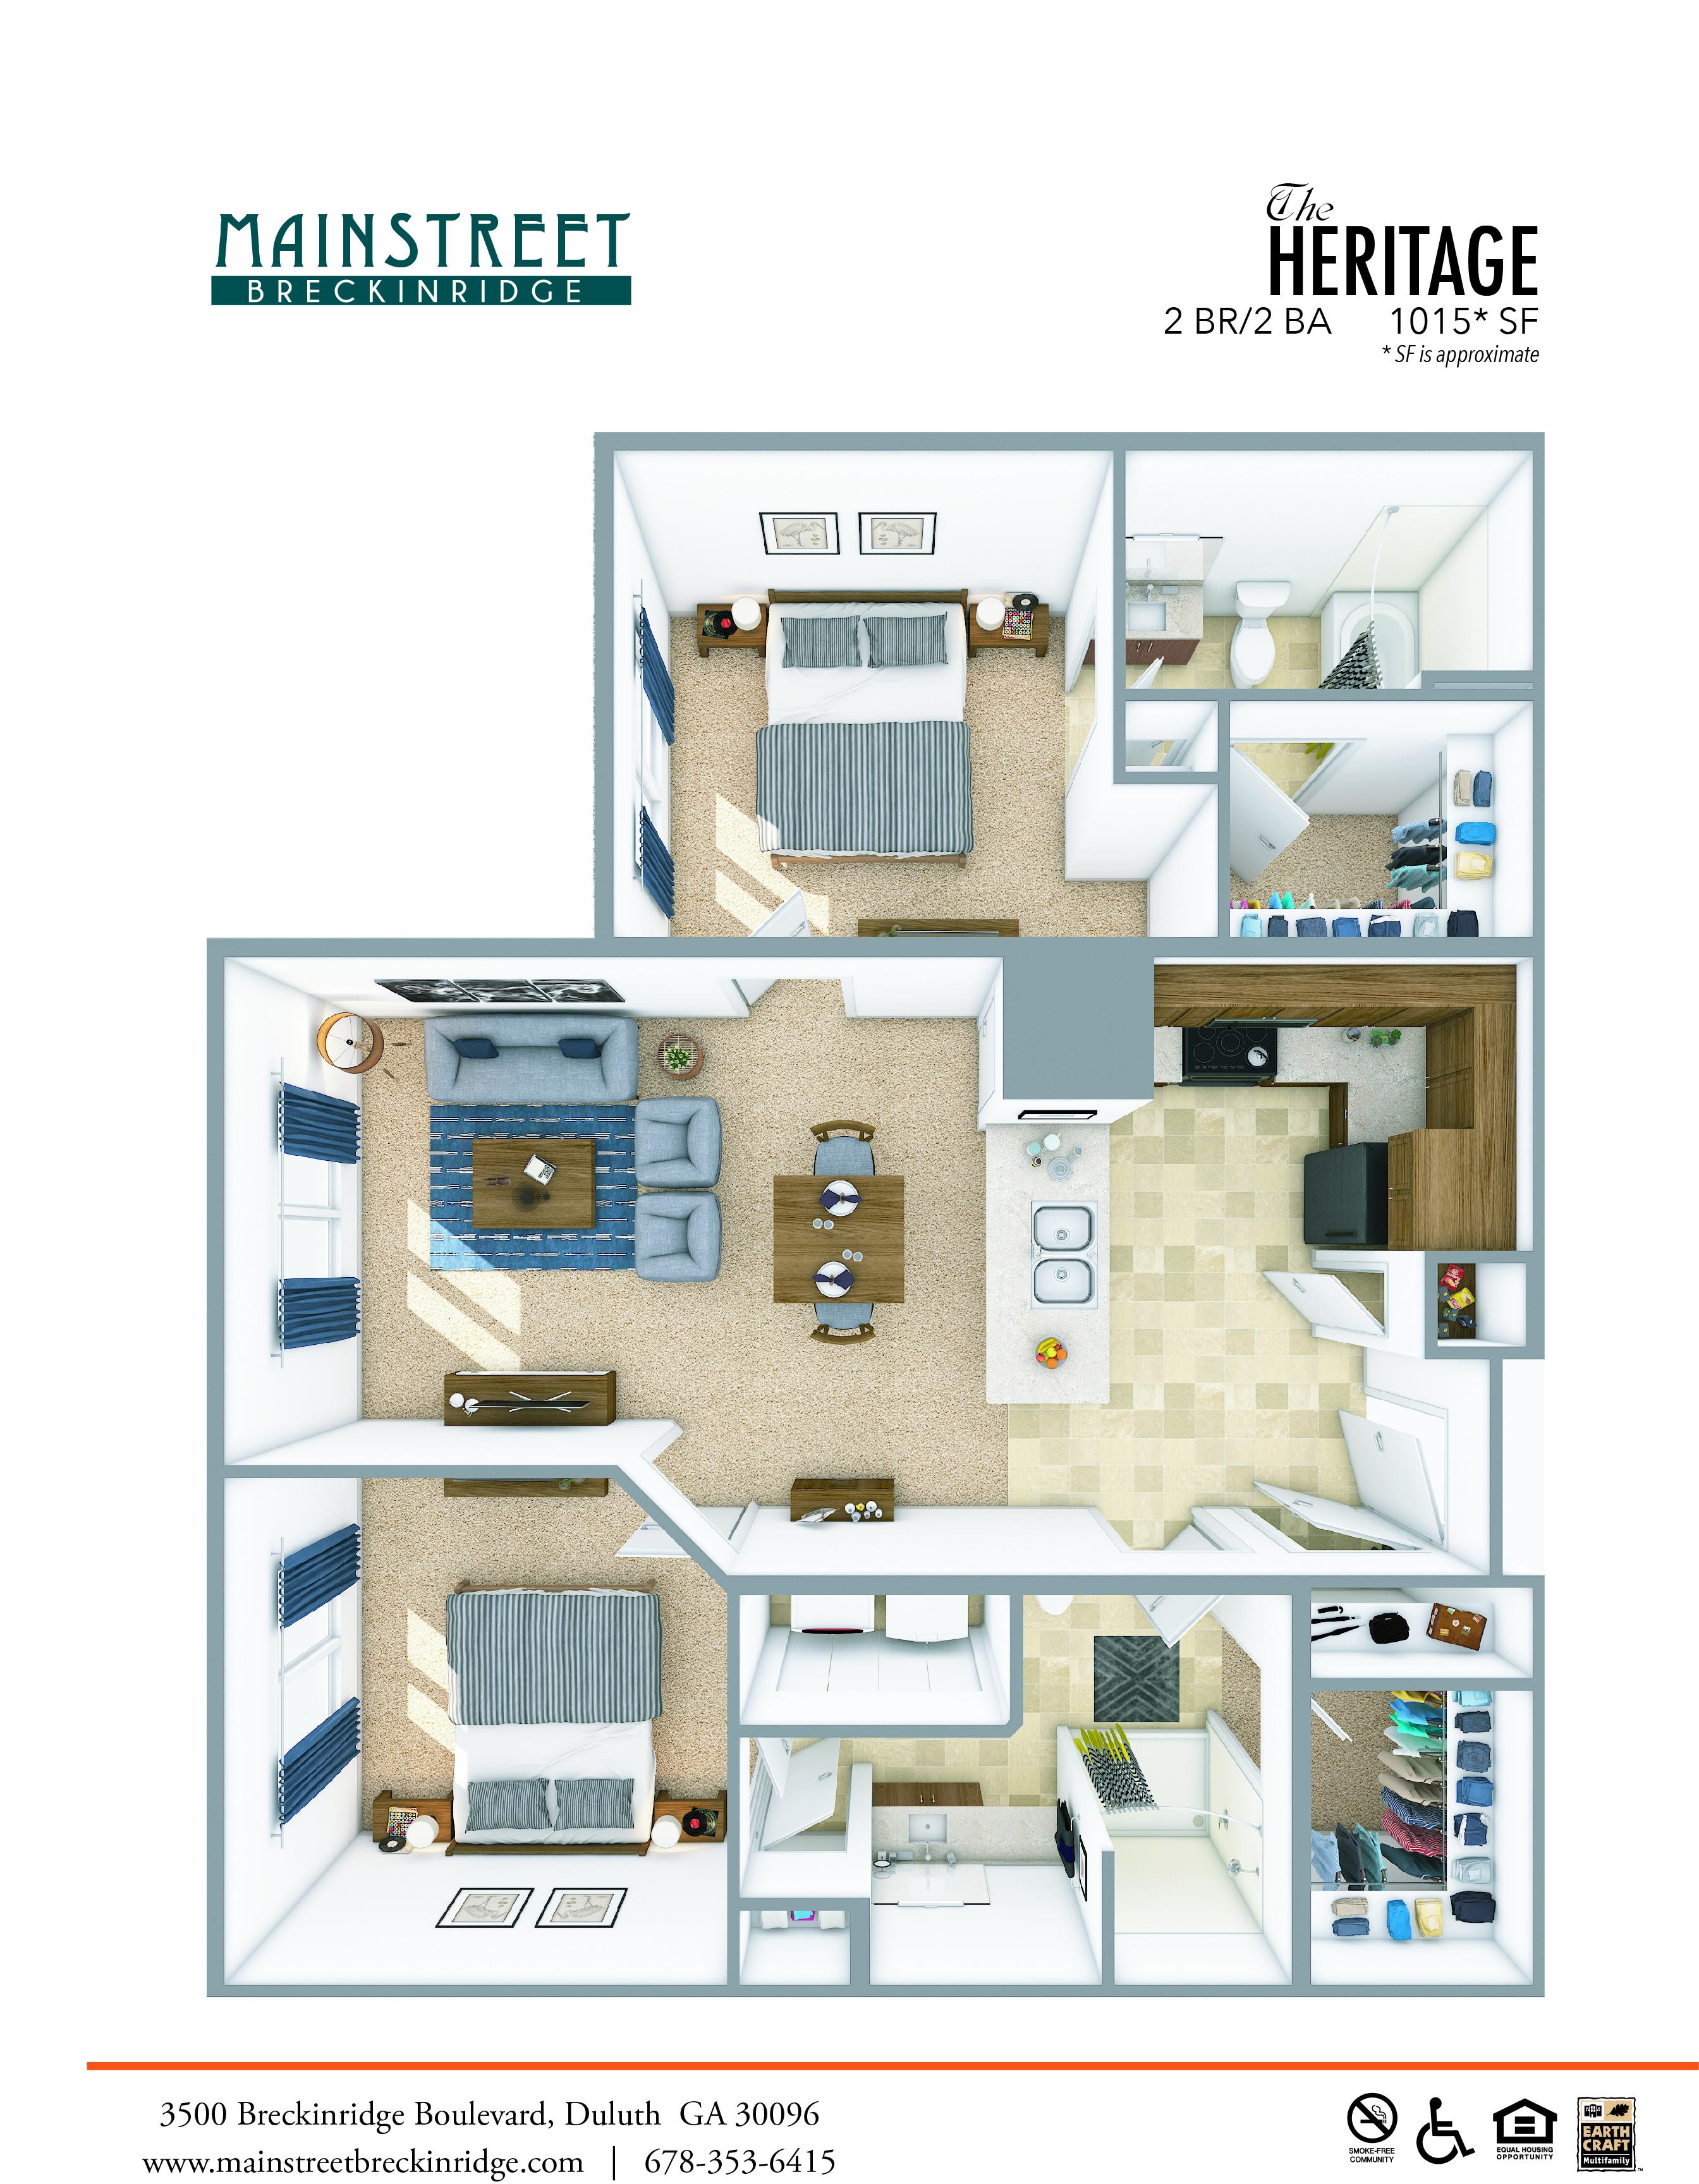 Image of Mainstreet Breckinridge